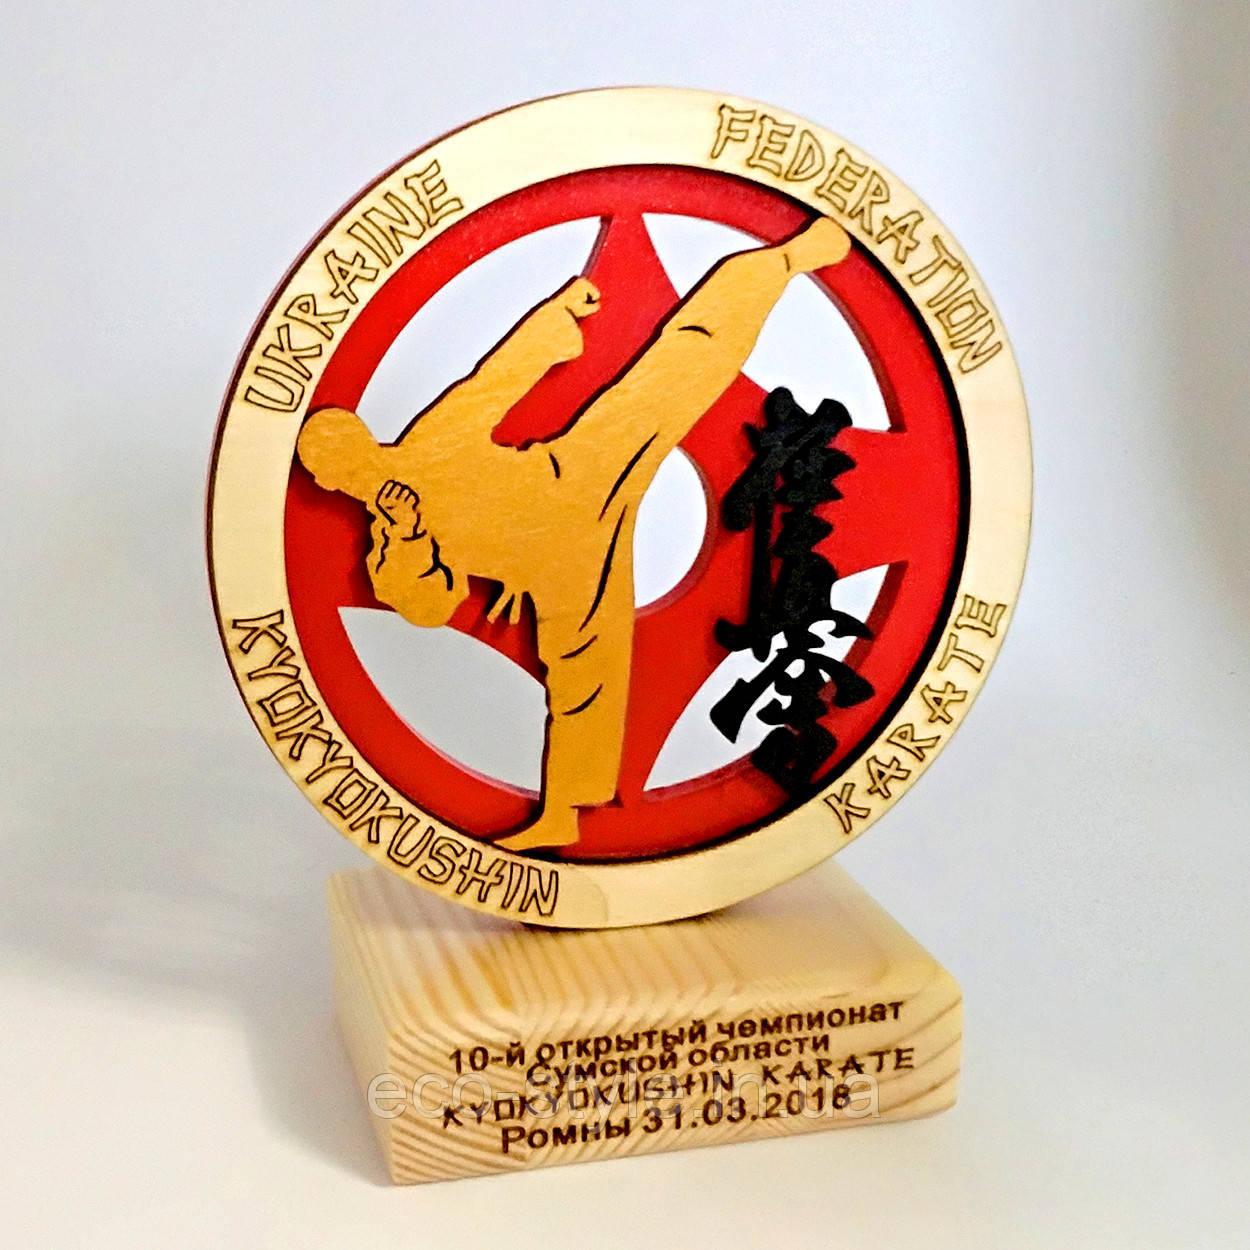 Кубок, спортивные награды, кубок карате